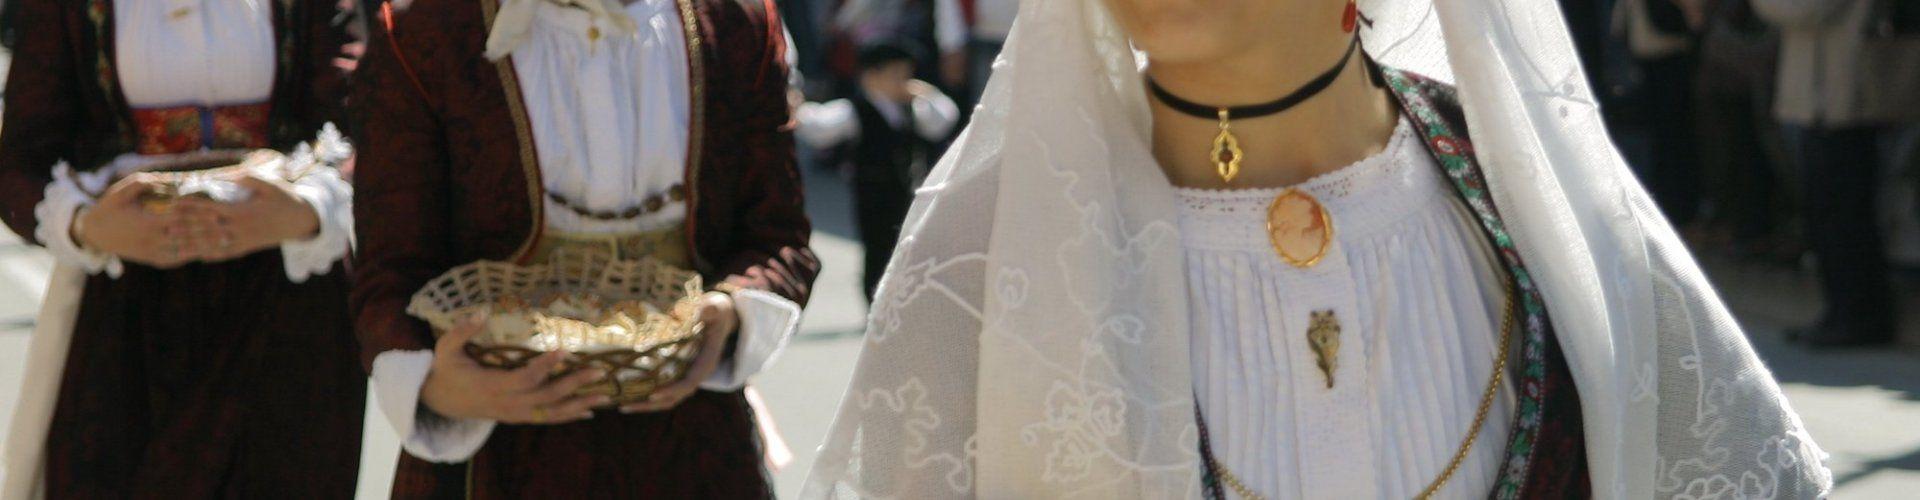 Donne in costumi sardi durante una processione